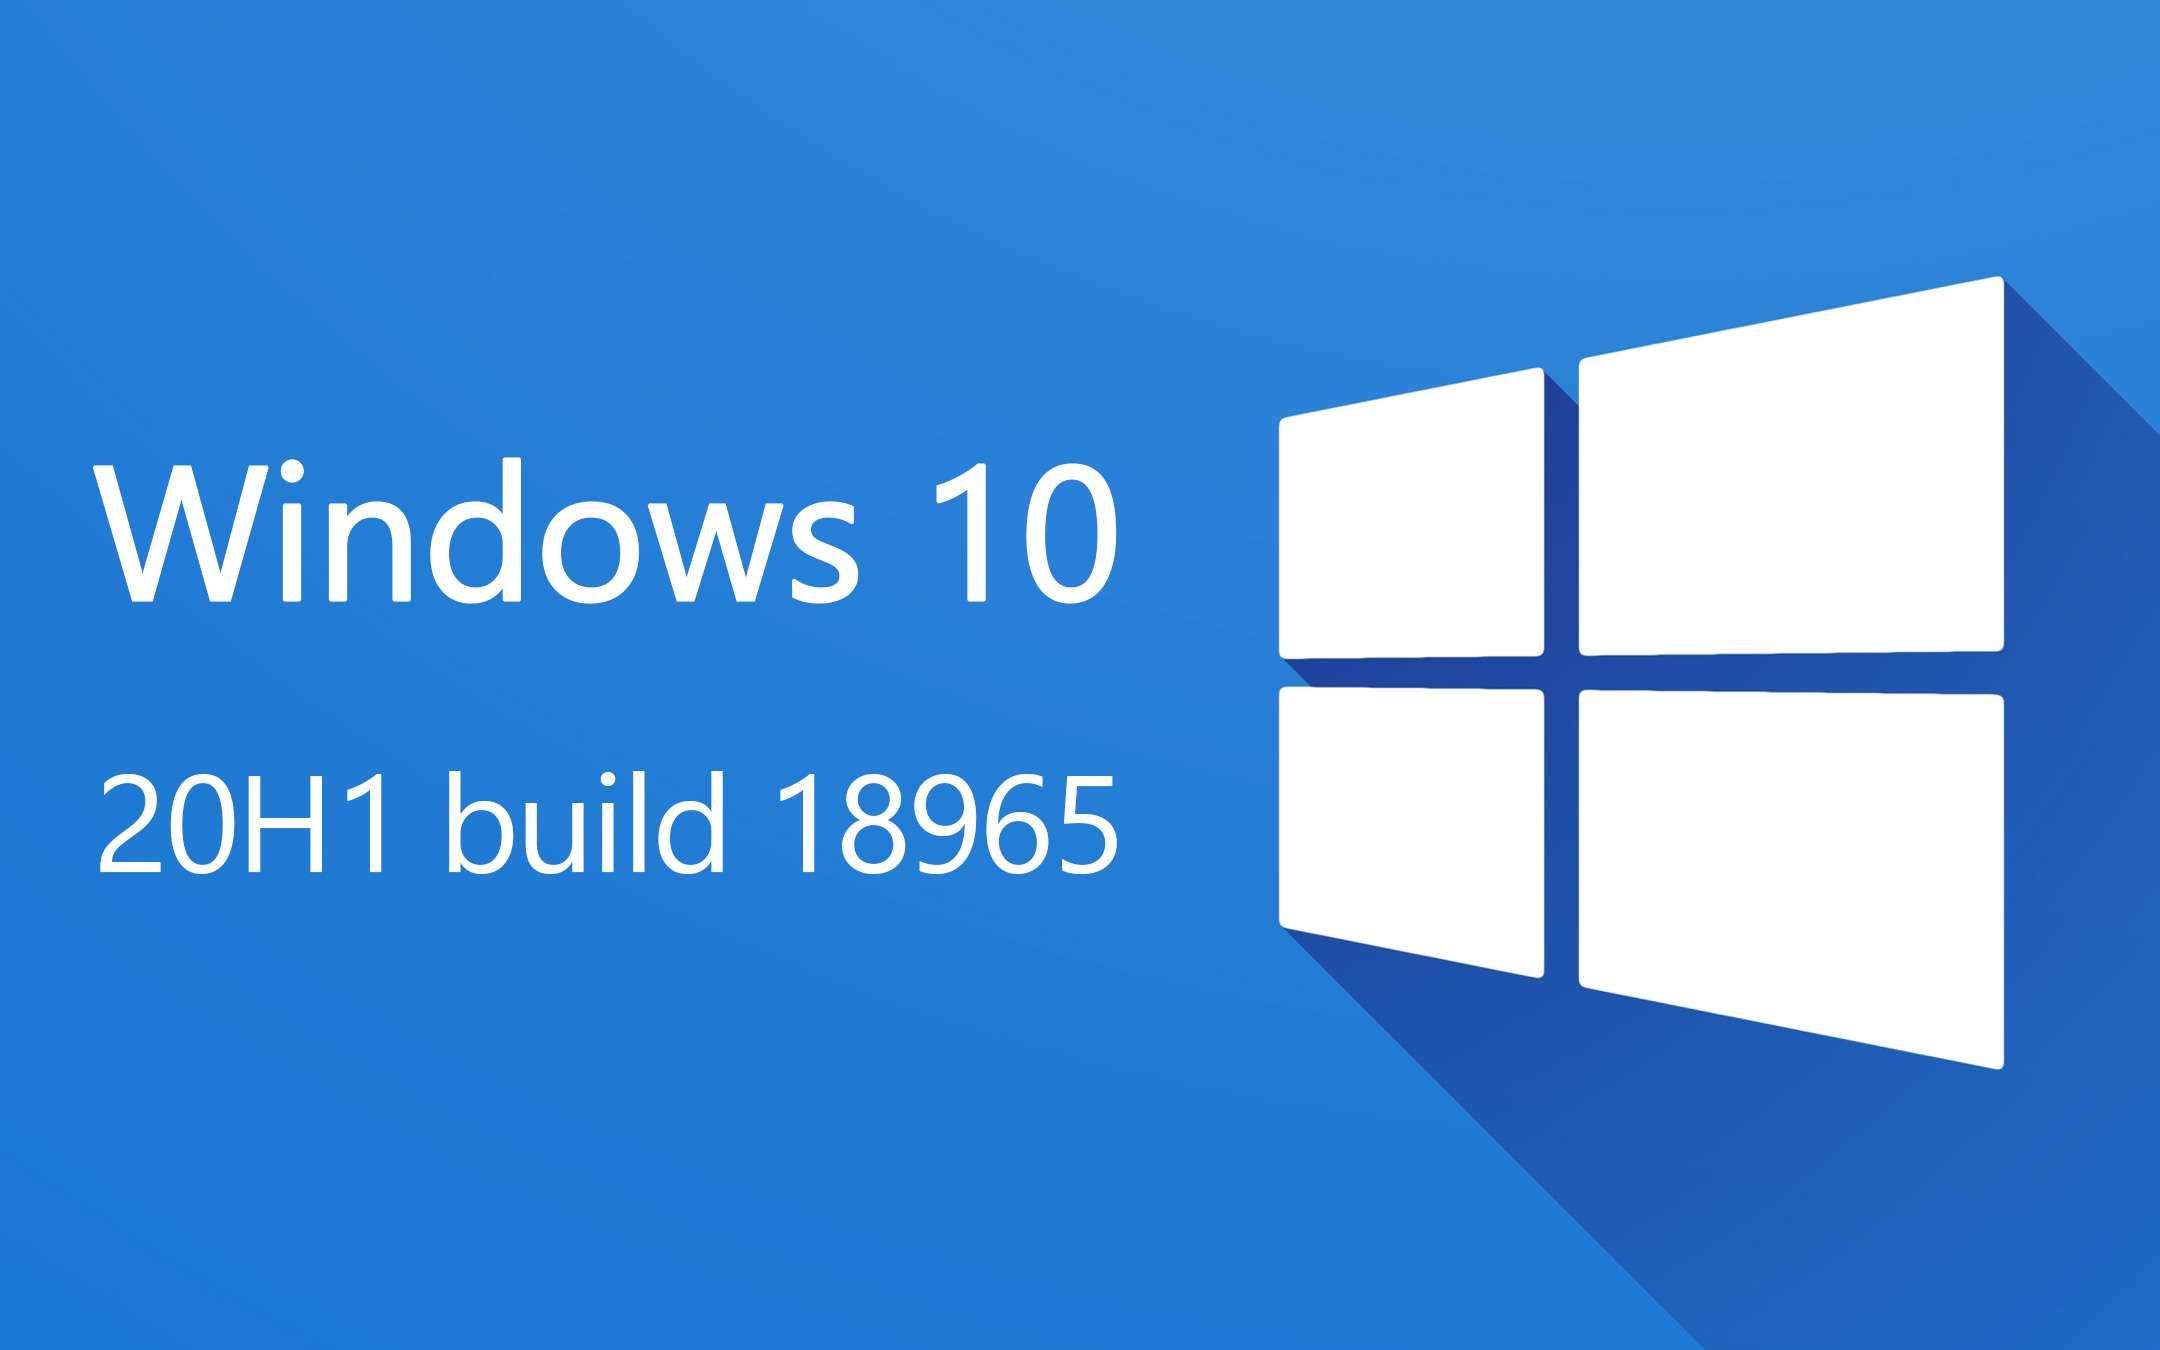 Windows 10 20H1 build 18965